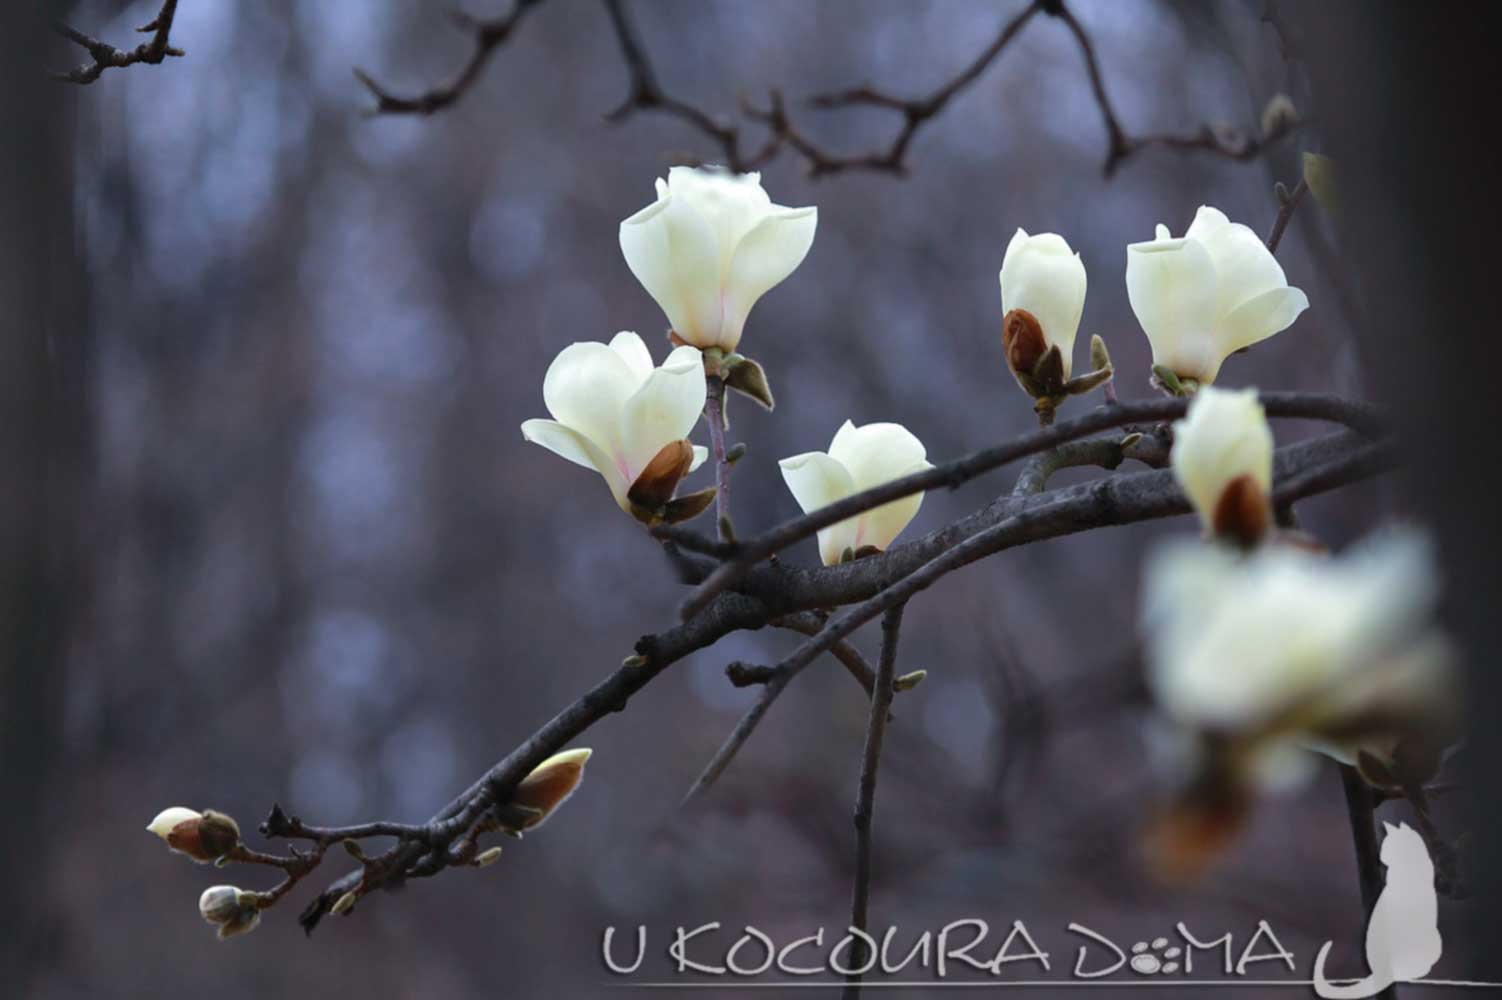 Magnolia, magnolie, šácholan - bílý květ